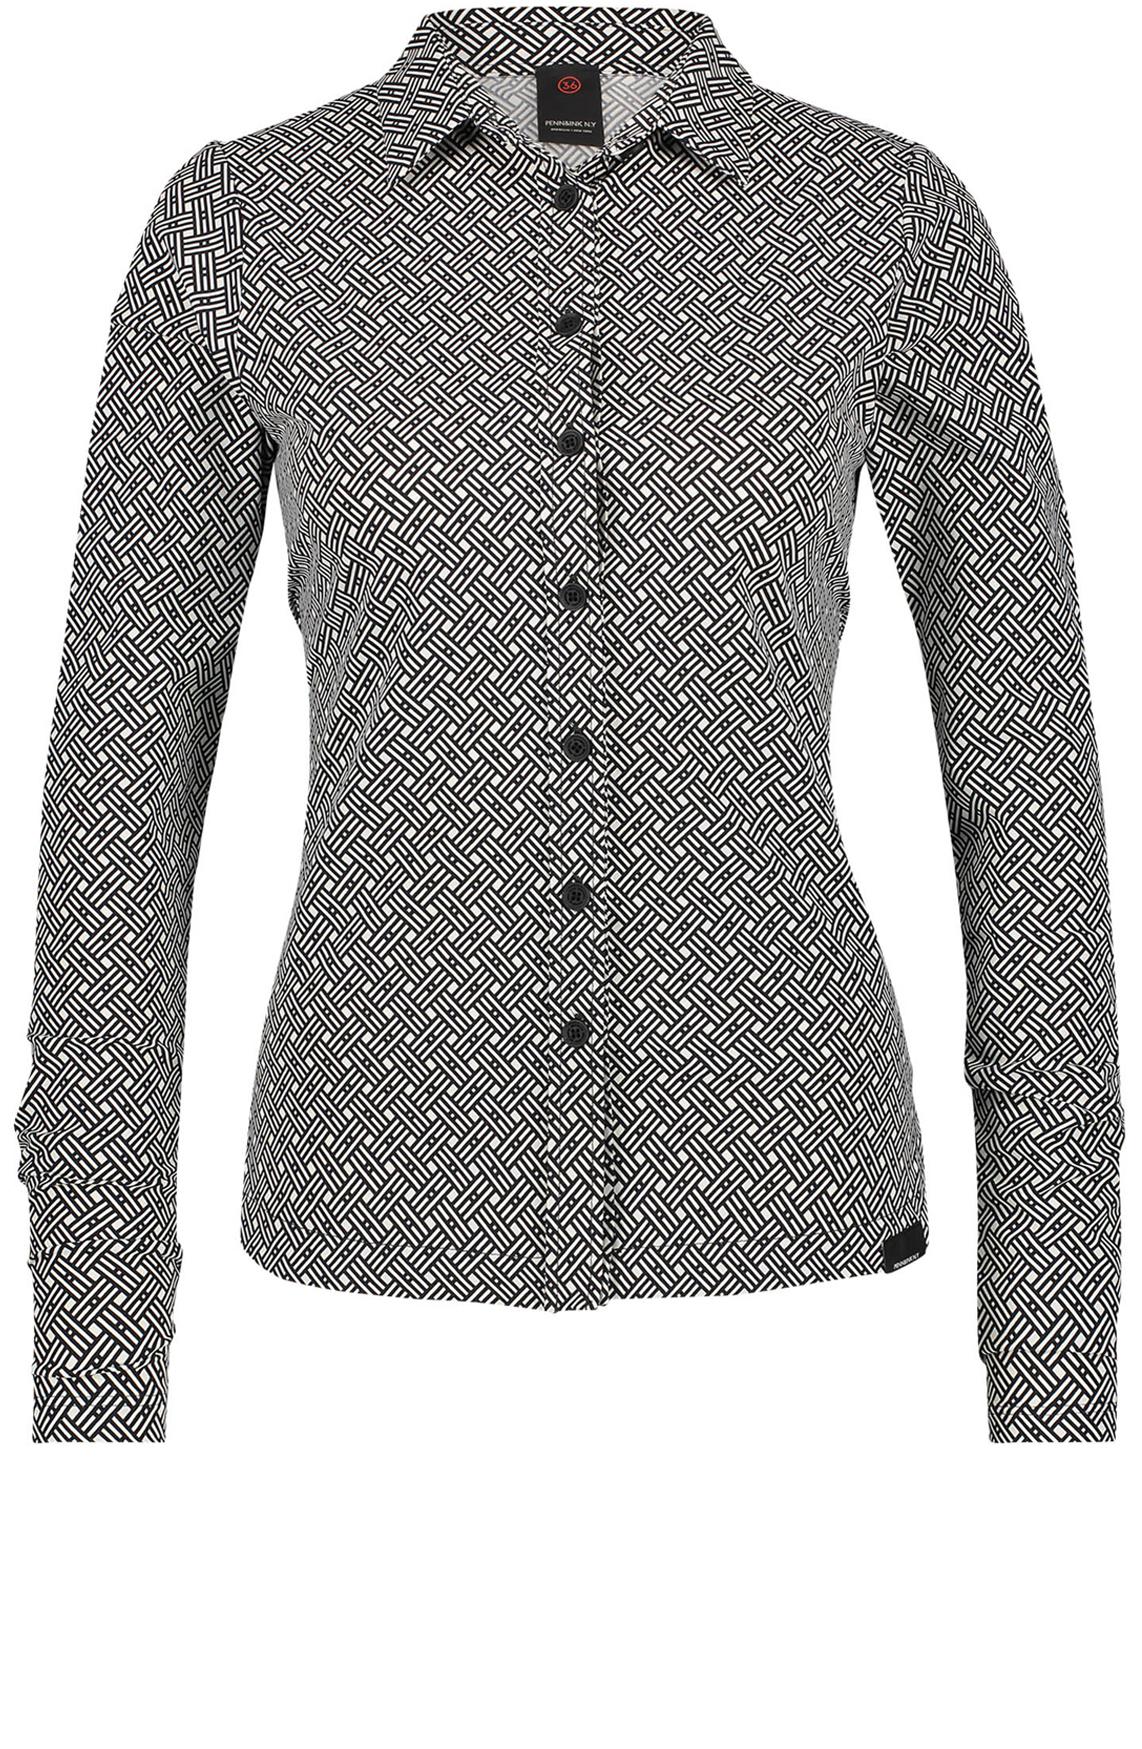 Penn & Ink Dames Blouse met grafische print zwart